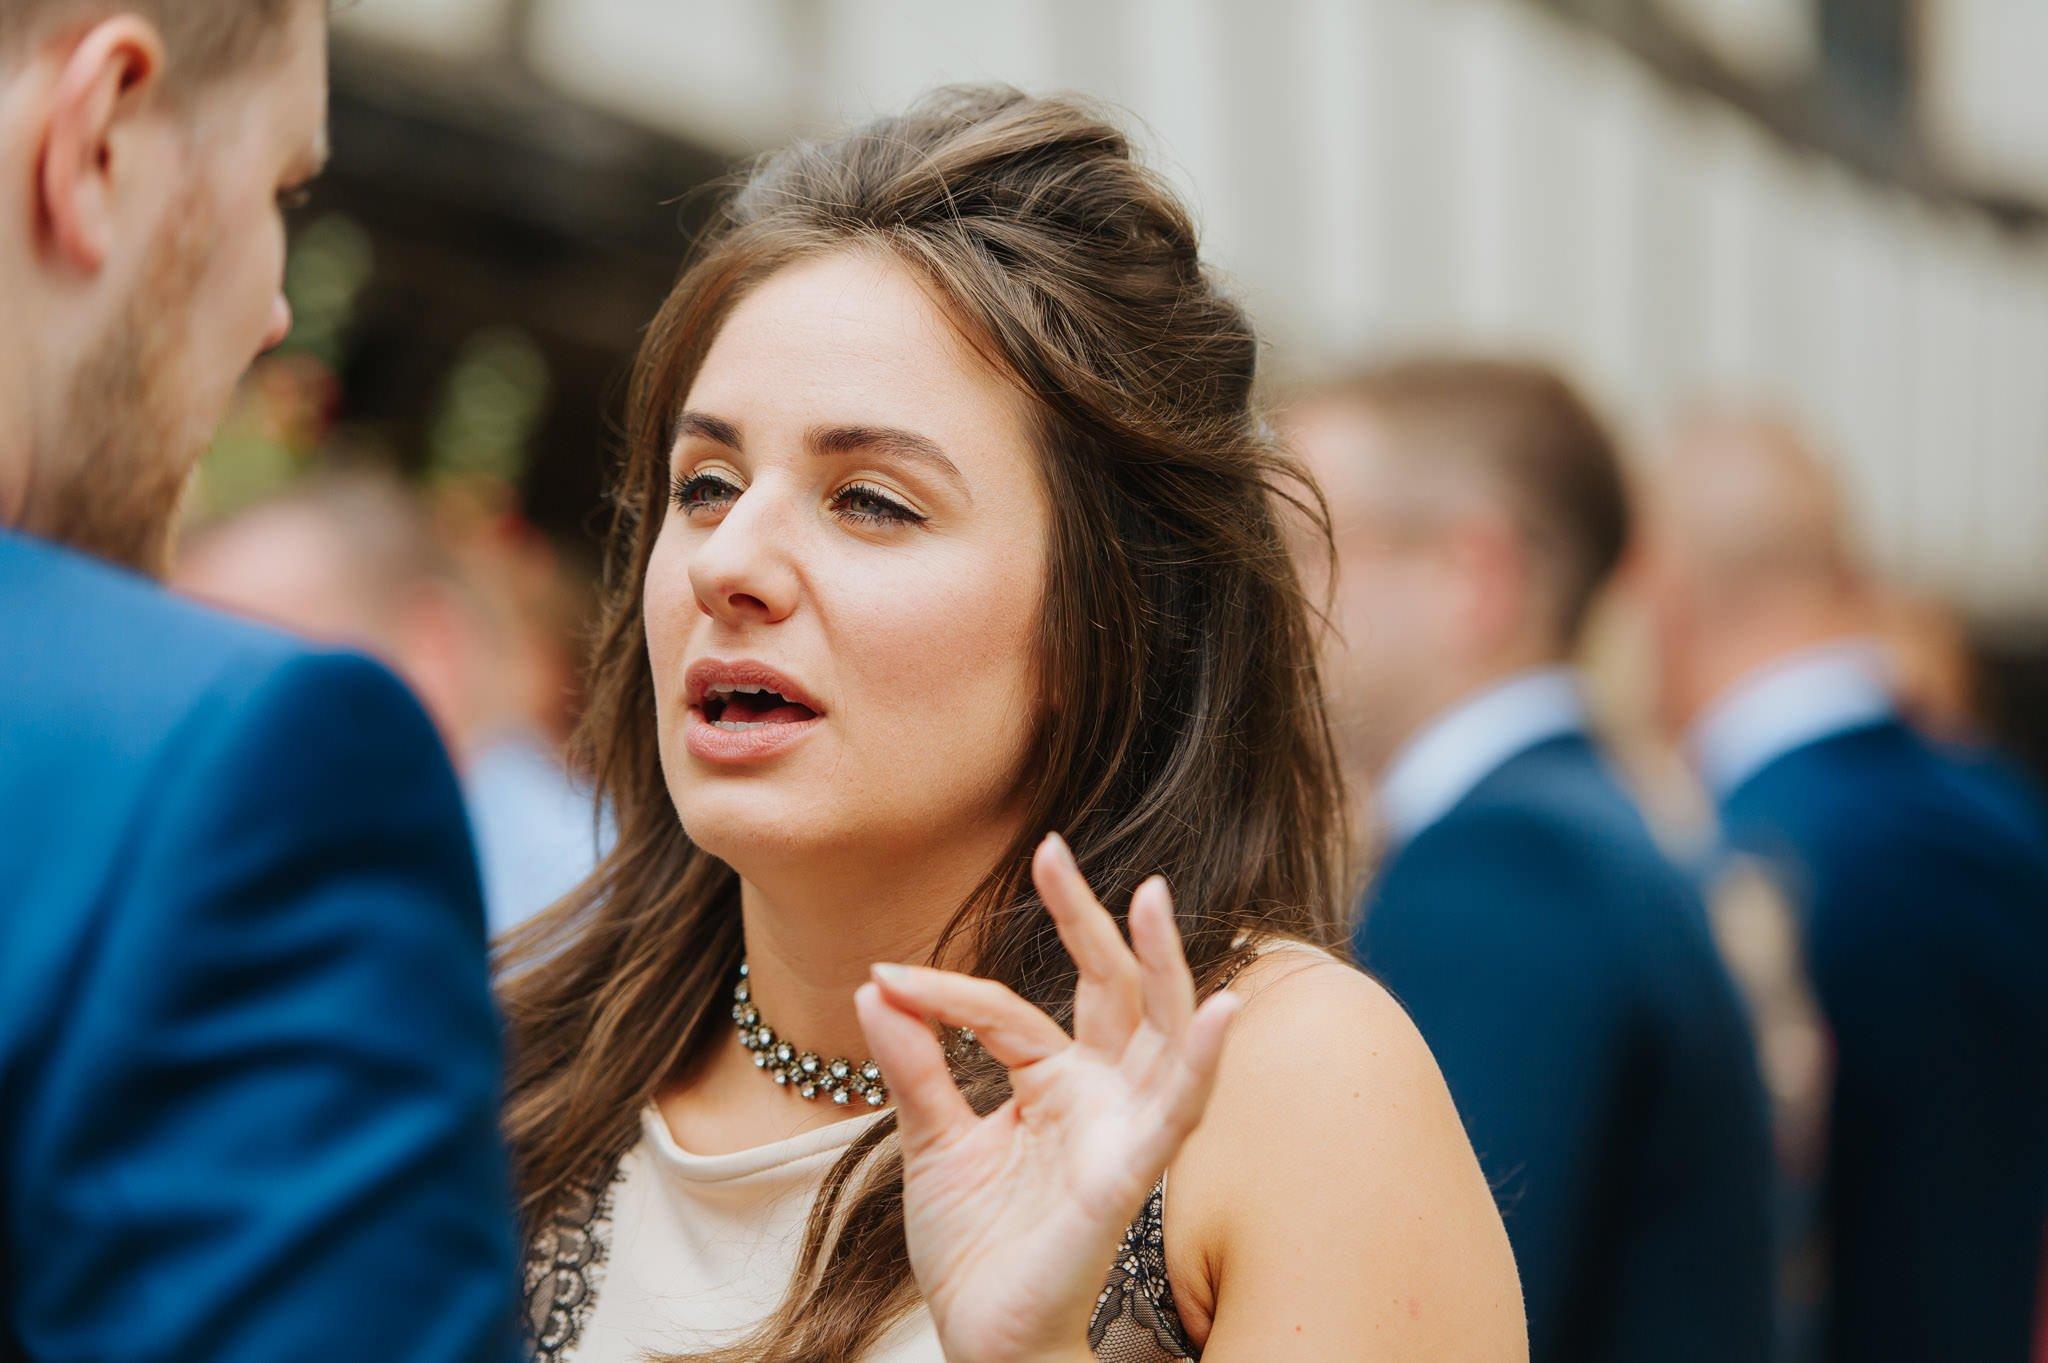 Eastnor Castle wedding photographer Herefordshire, West Midlands - Sarah + Dean 18